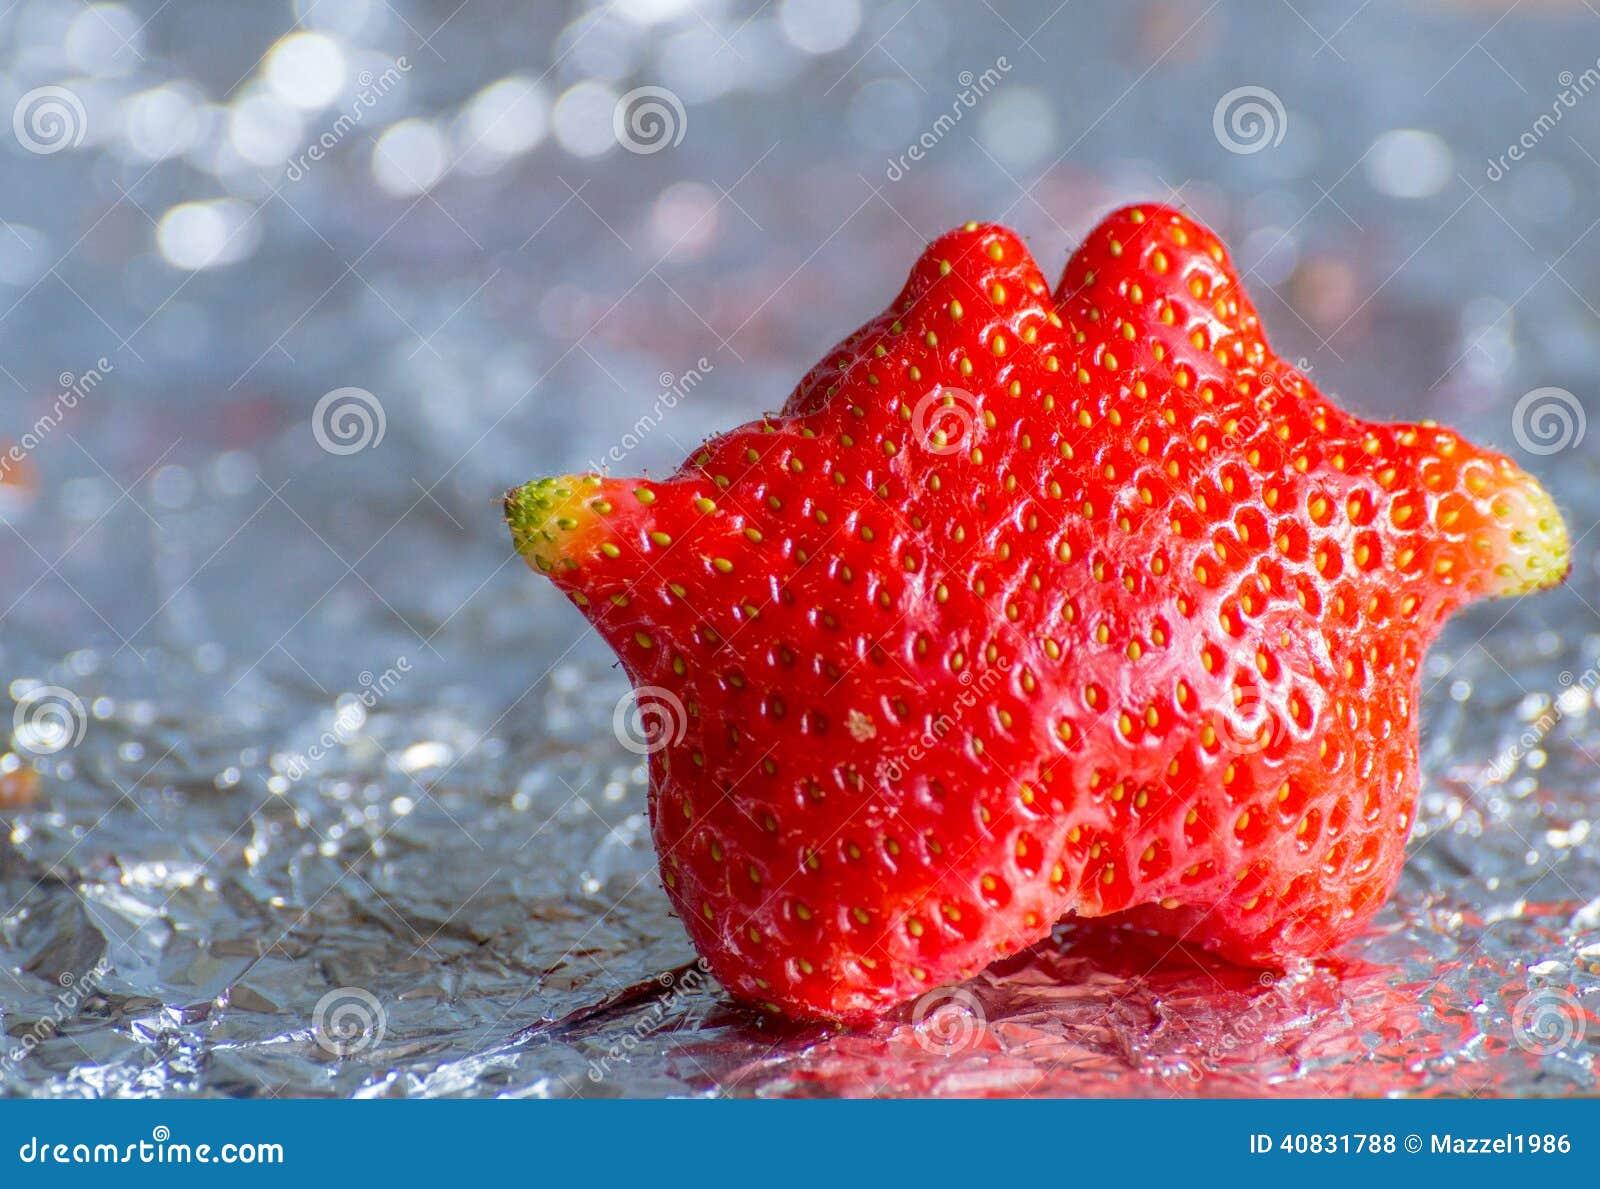 Odd Shaped Strawberry